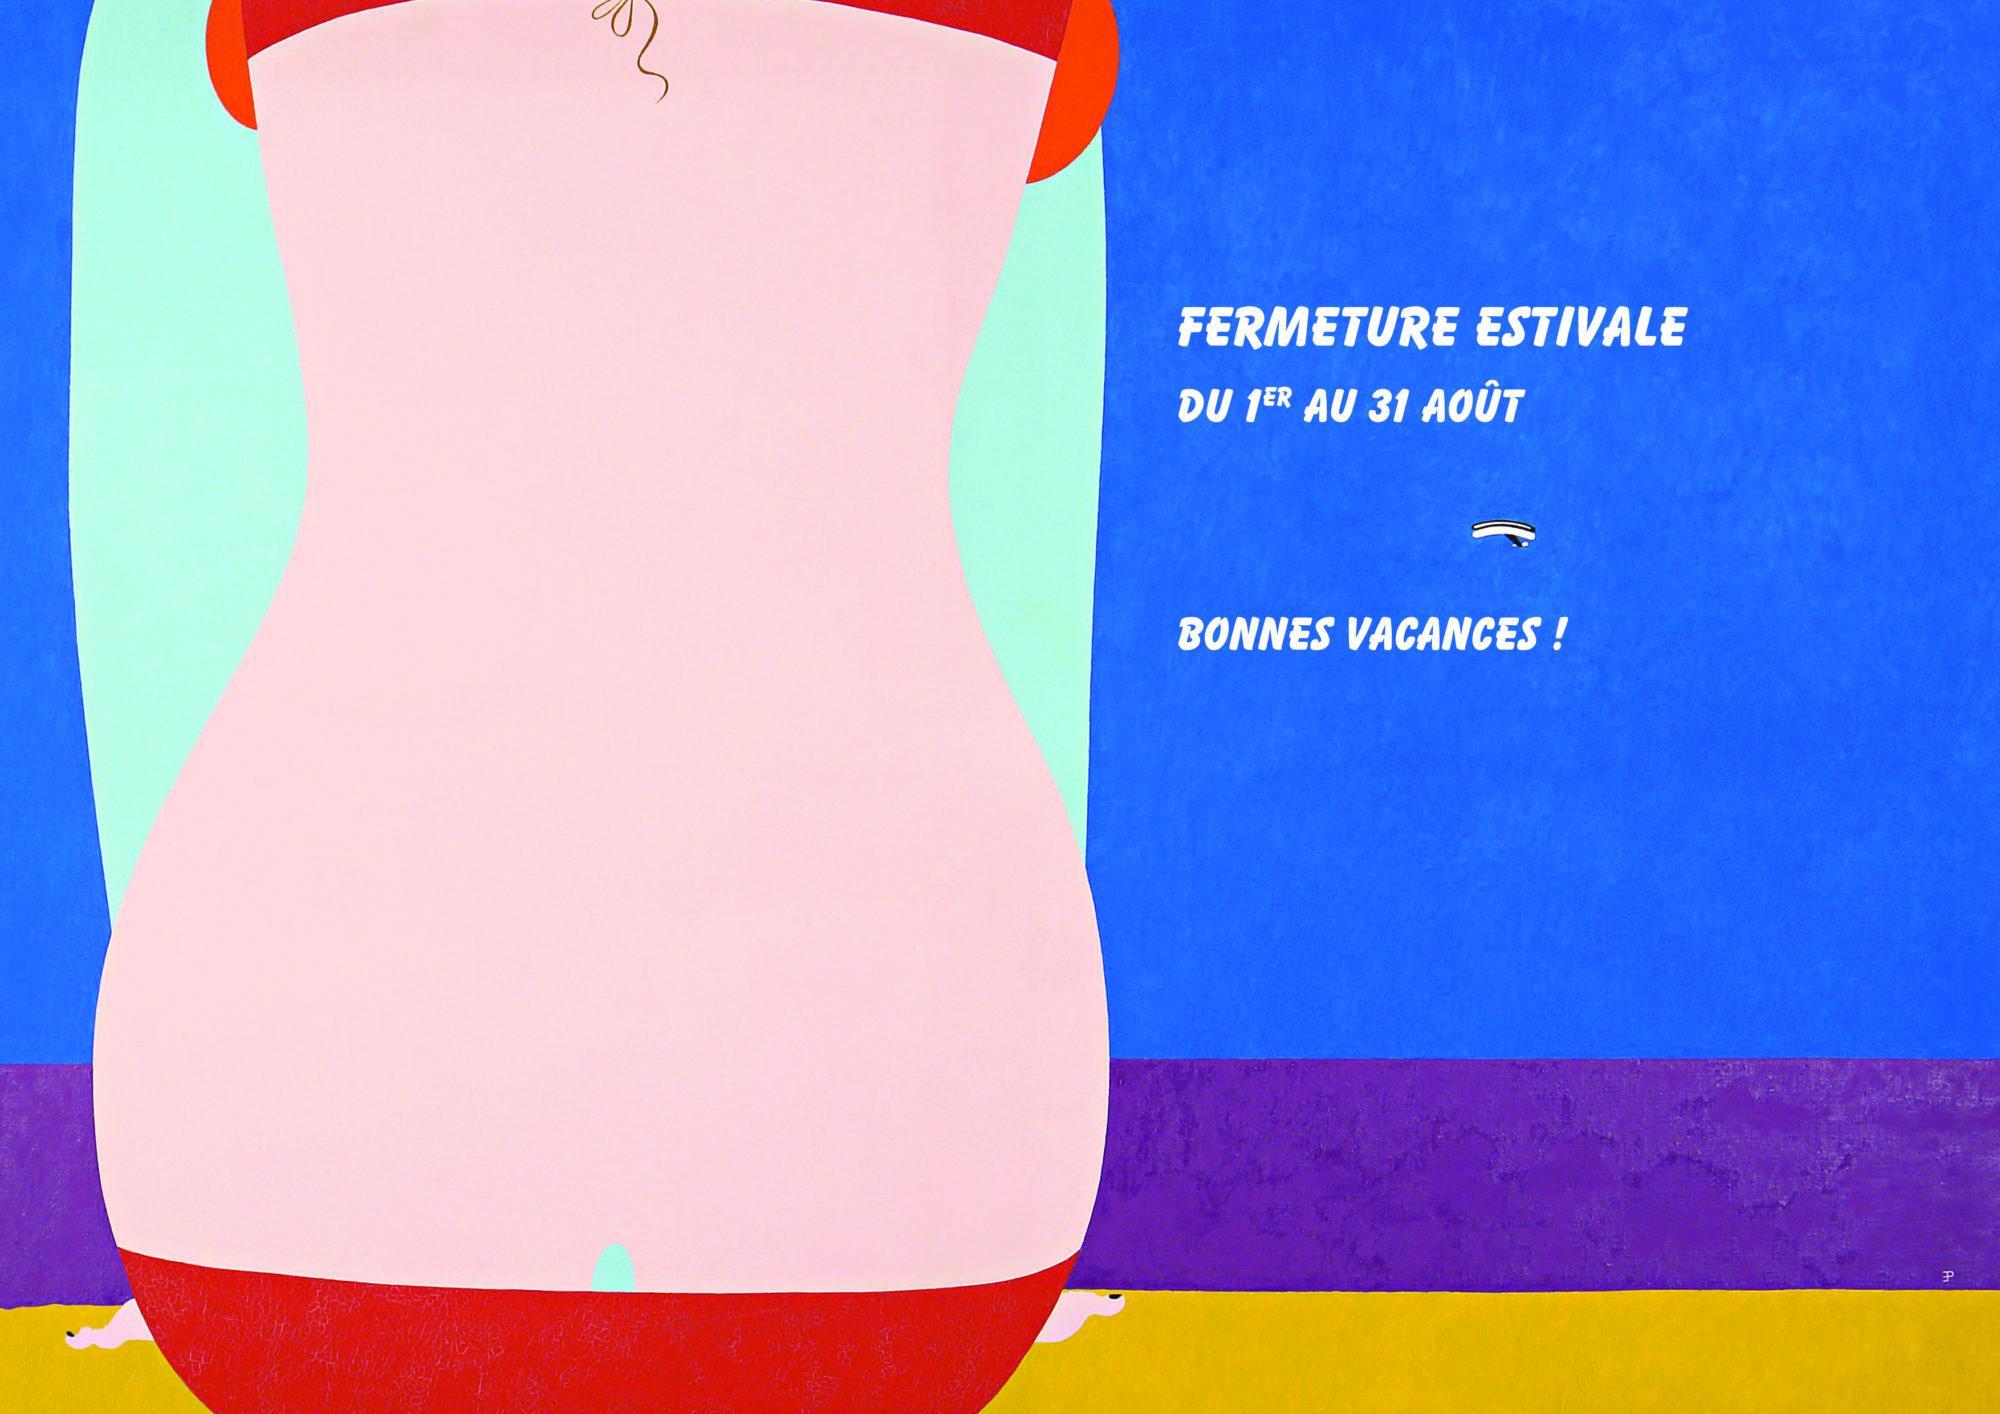 Fermeture estivale - Galerie Georges-Philippe & Nathalie Vallois